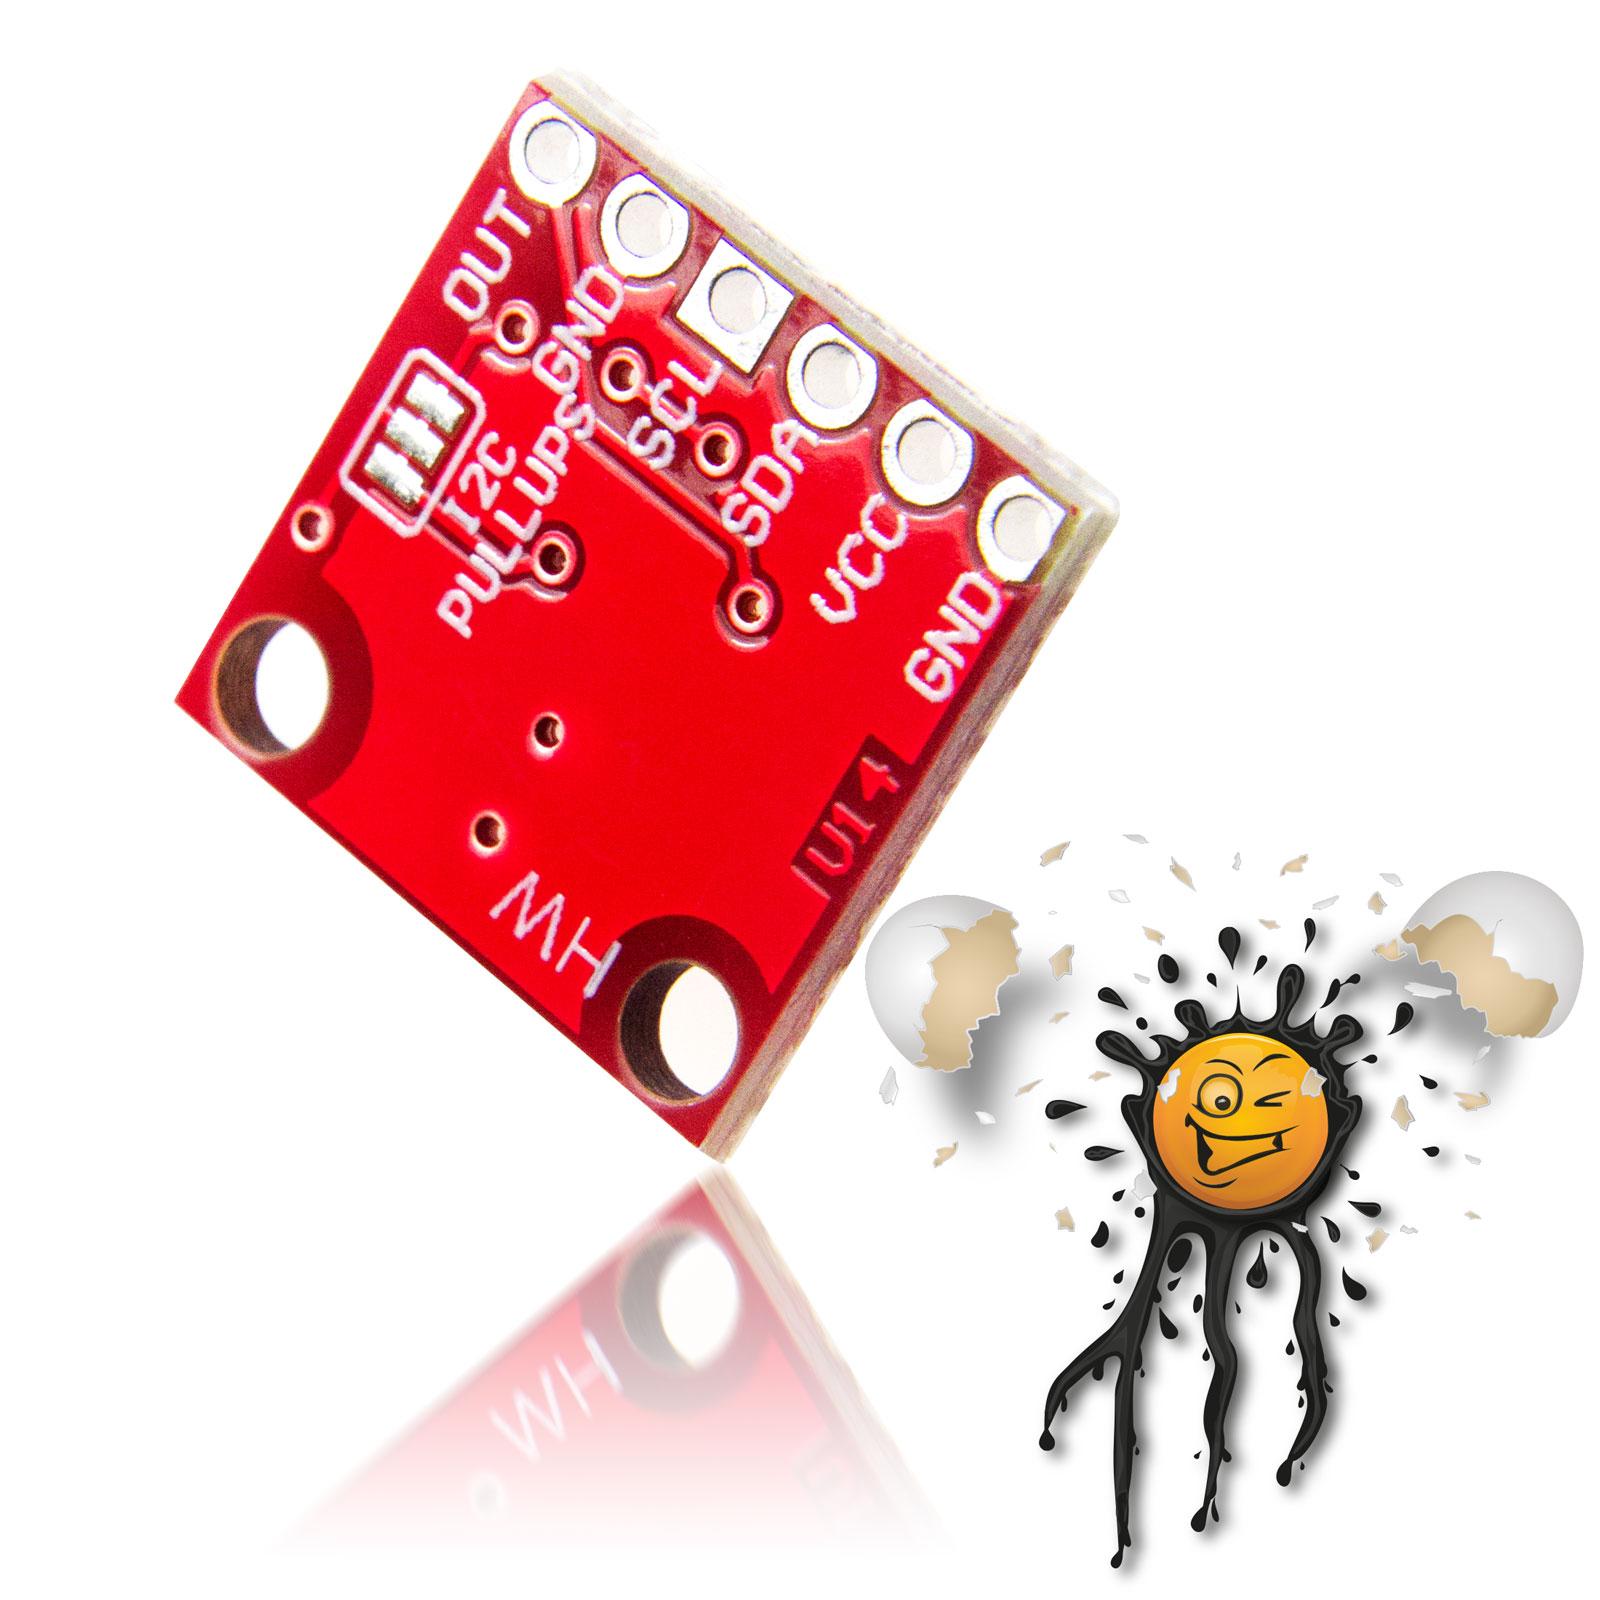 MCP4725 I2C Digital Analog Converter Module